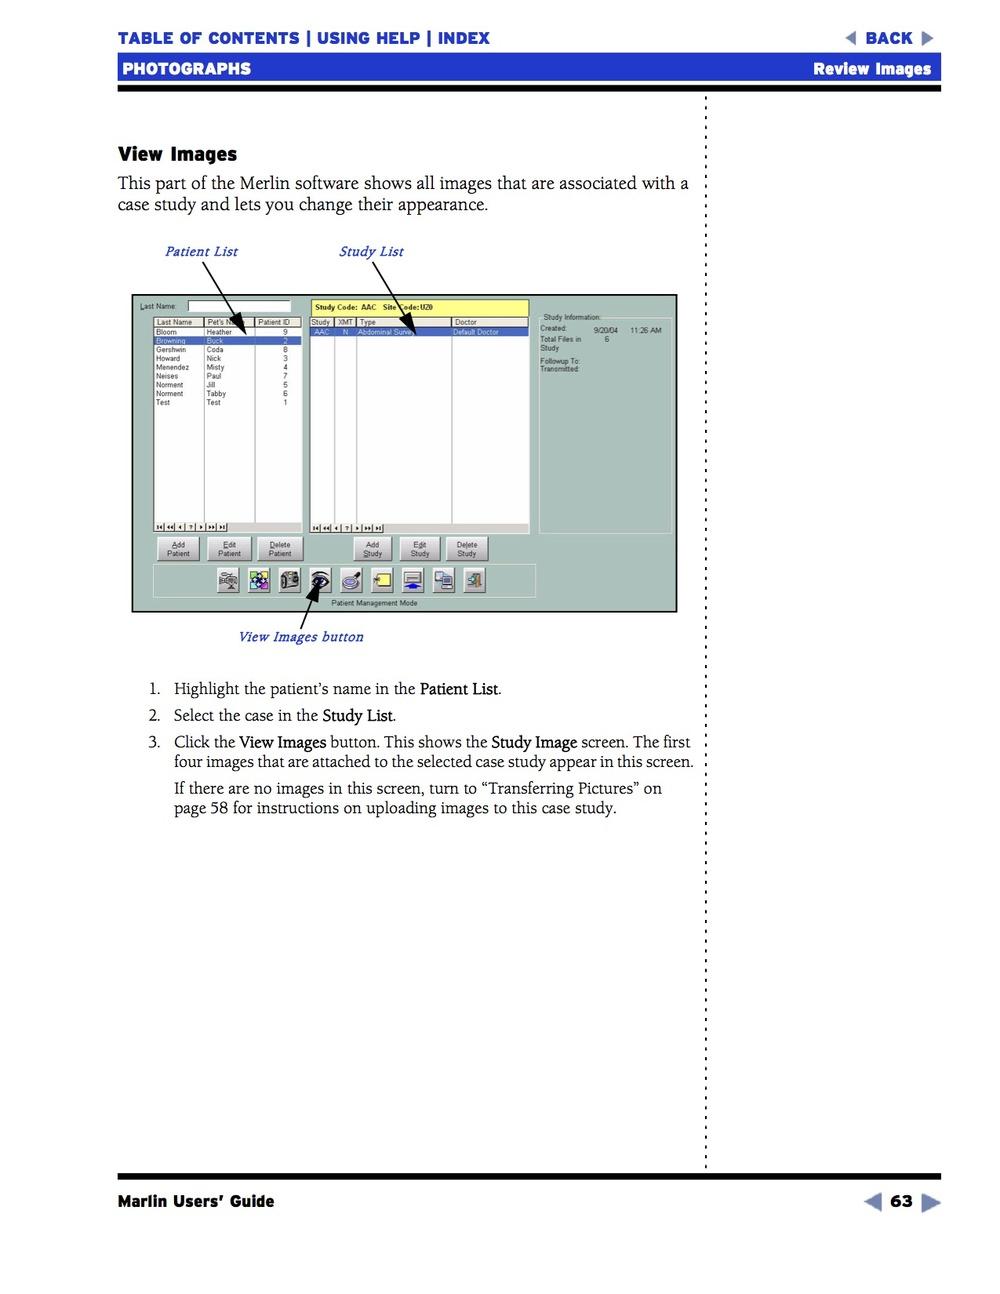 Telemedicine_Users_Guide7a.jpg